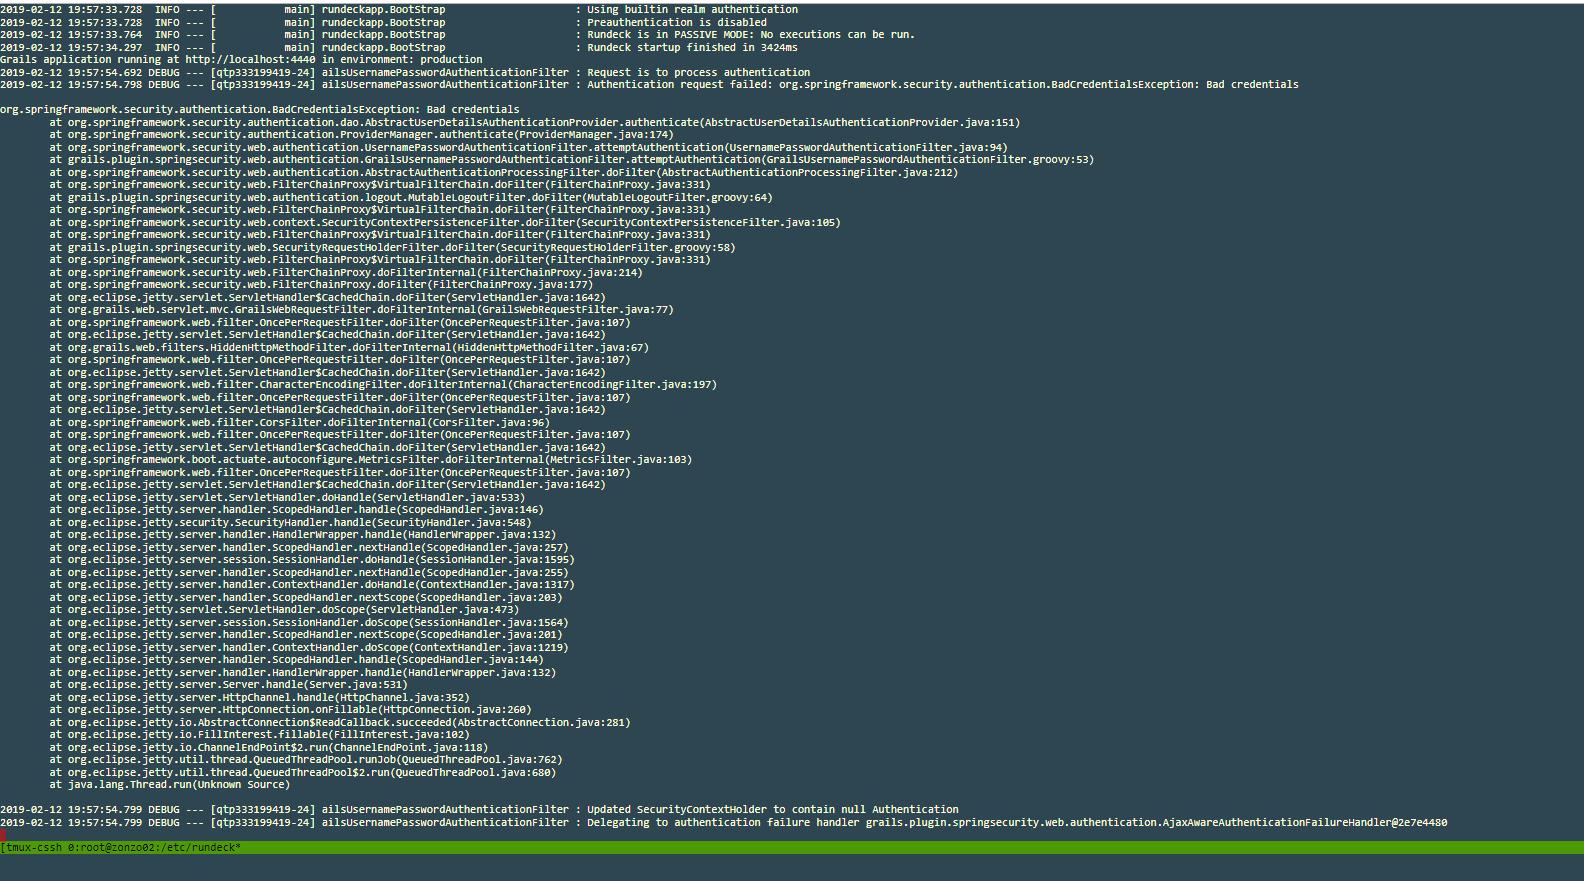 Active Directory authentication client returns bad credentials